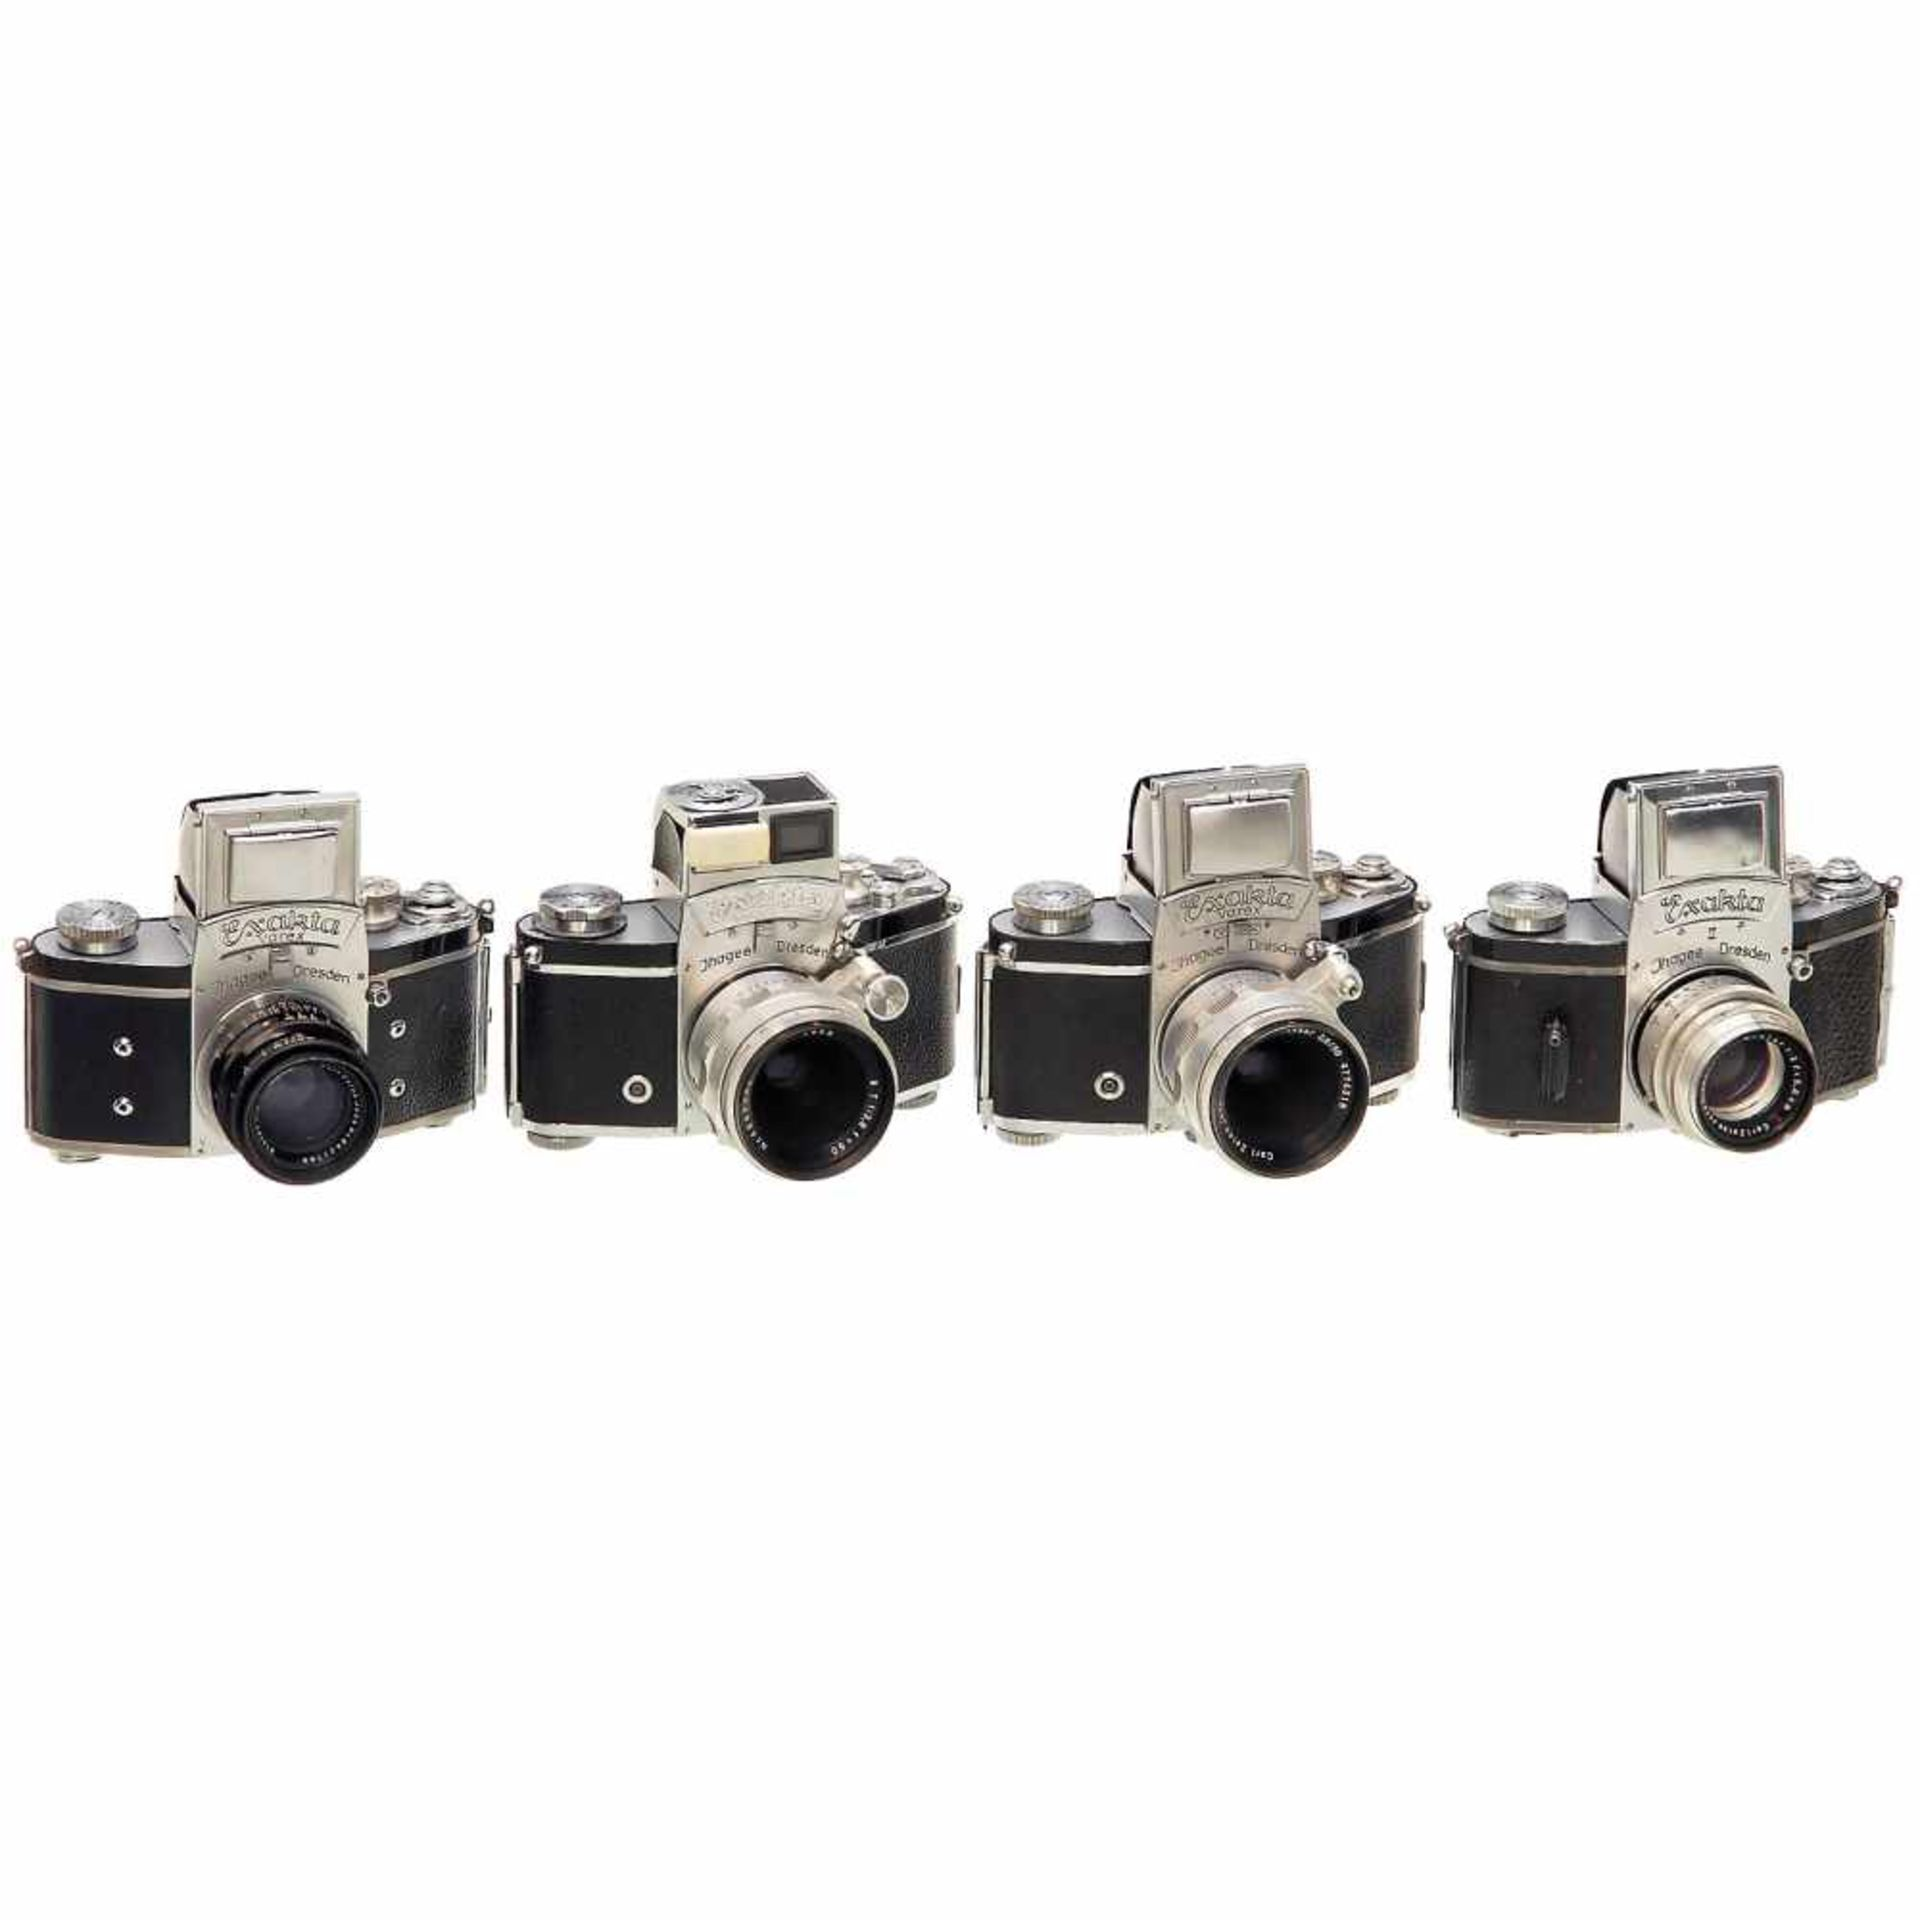 4 Exakta CamerasIhagee, Dresden. 1) Exakta II, 1949, no. 661135, Biotar 2/5,8 cm T, no. 2825389. –